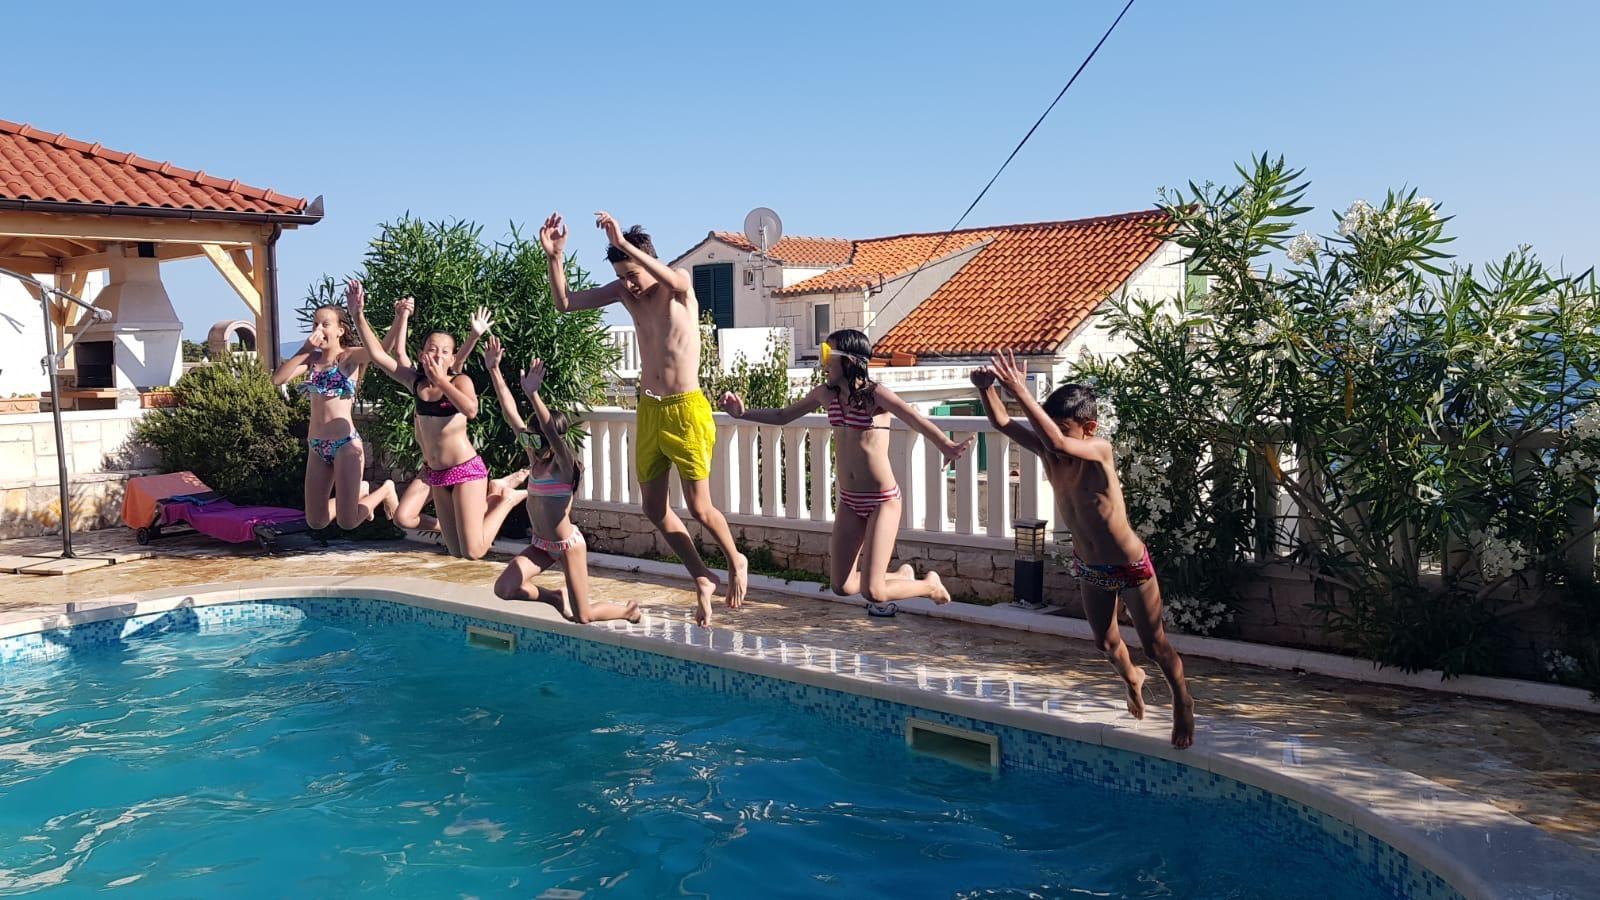 Children jumping into the swimming pool of the Villa Mir Vami in Sumartin in Croatia